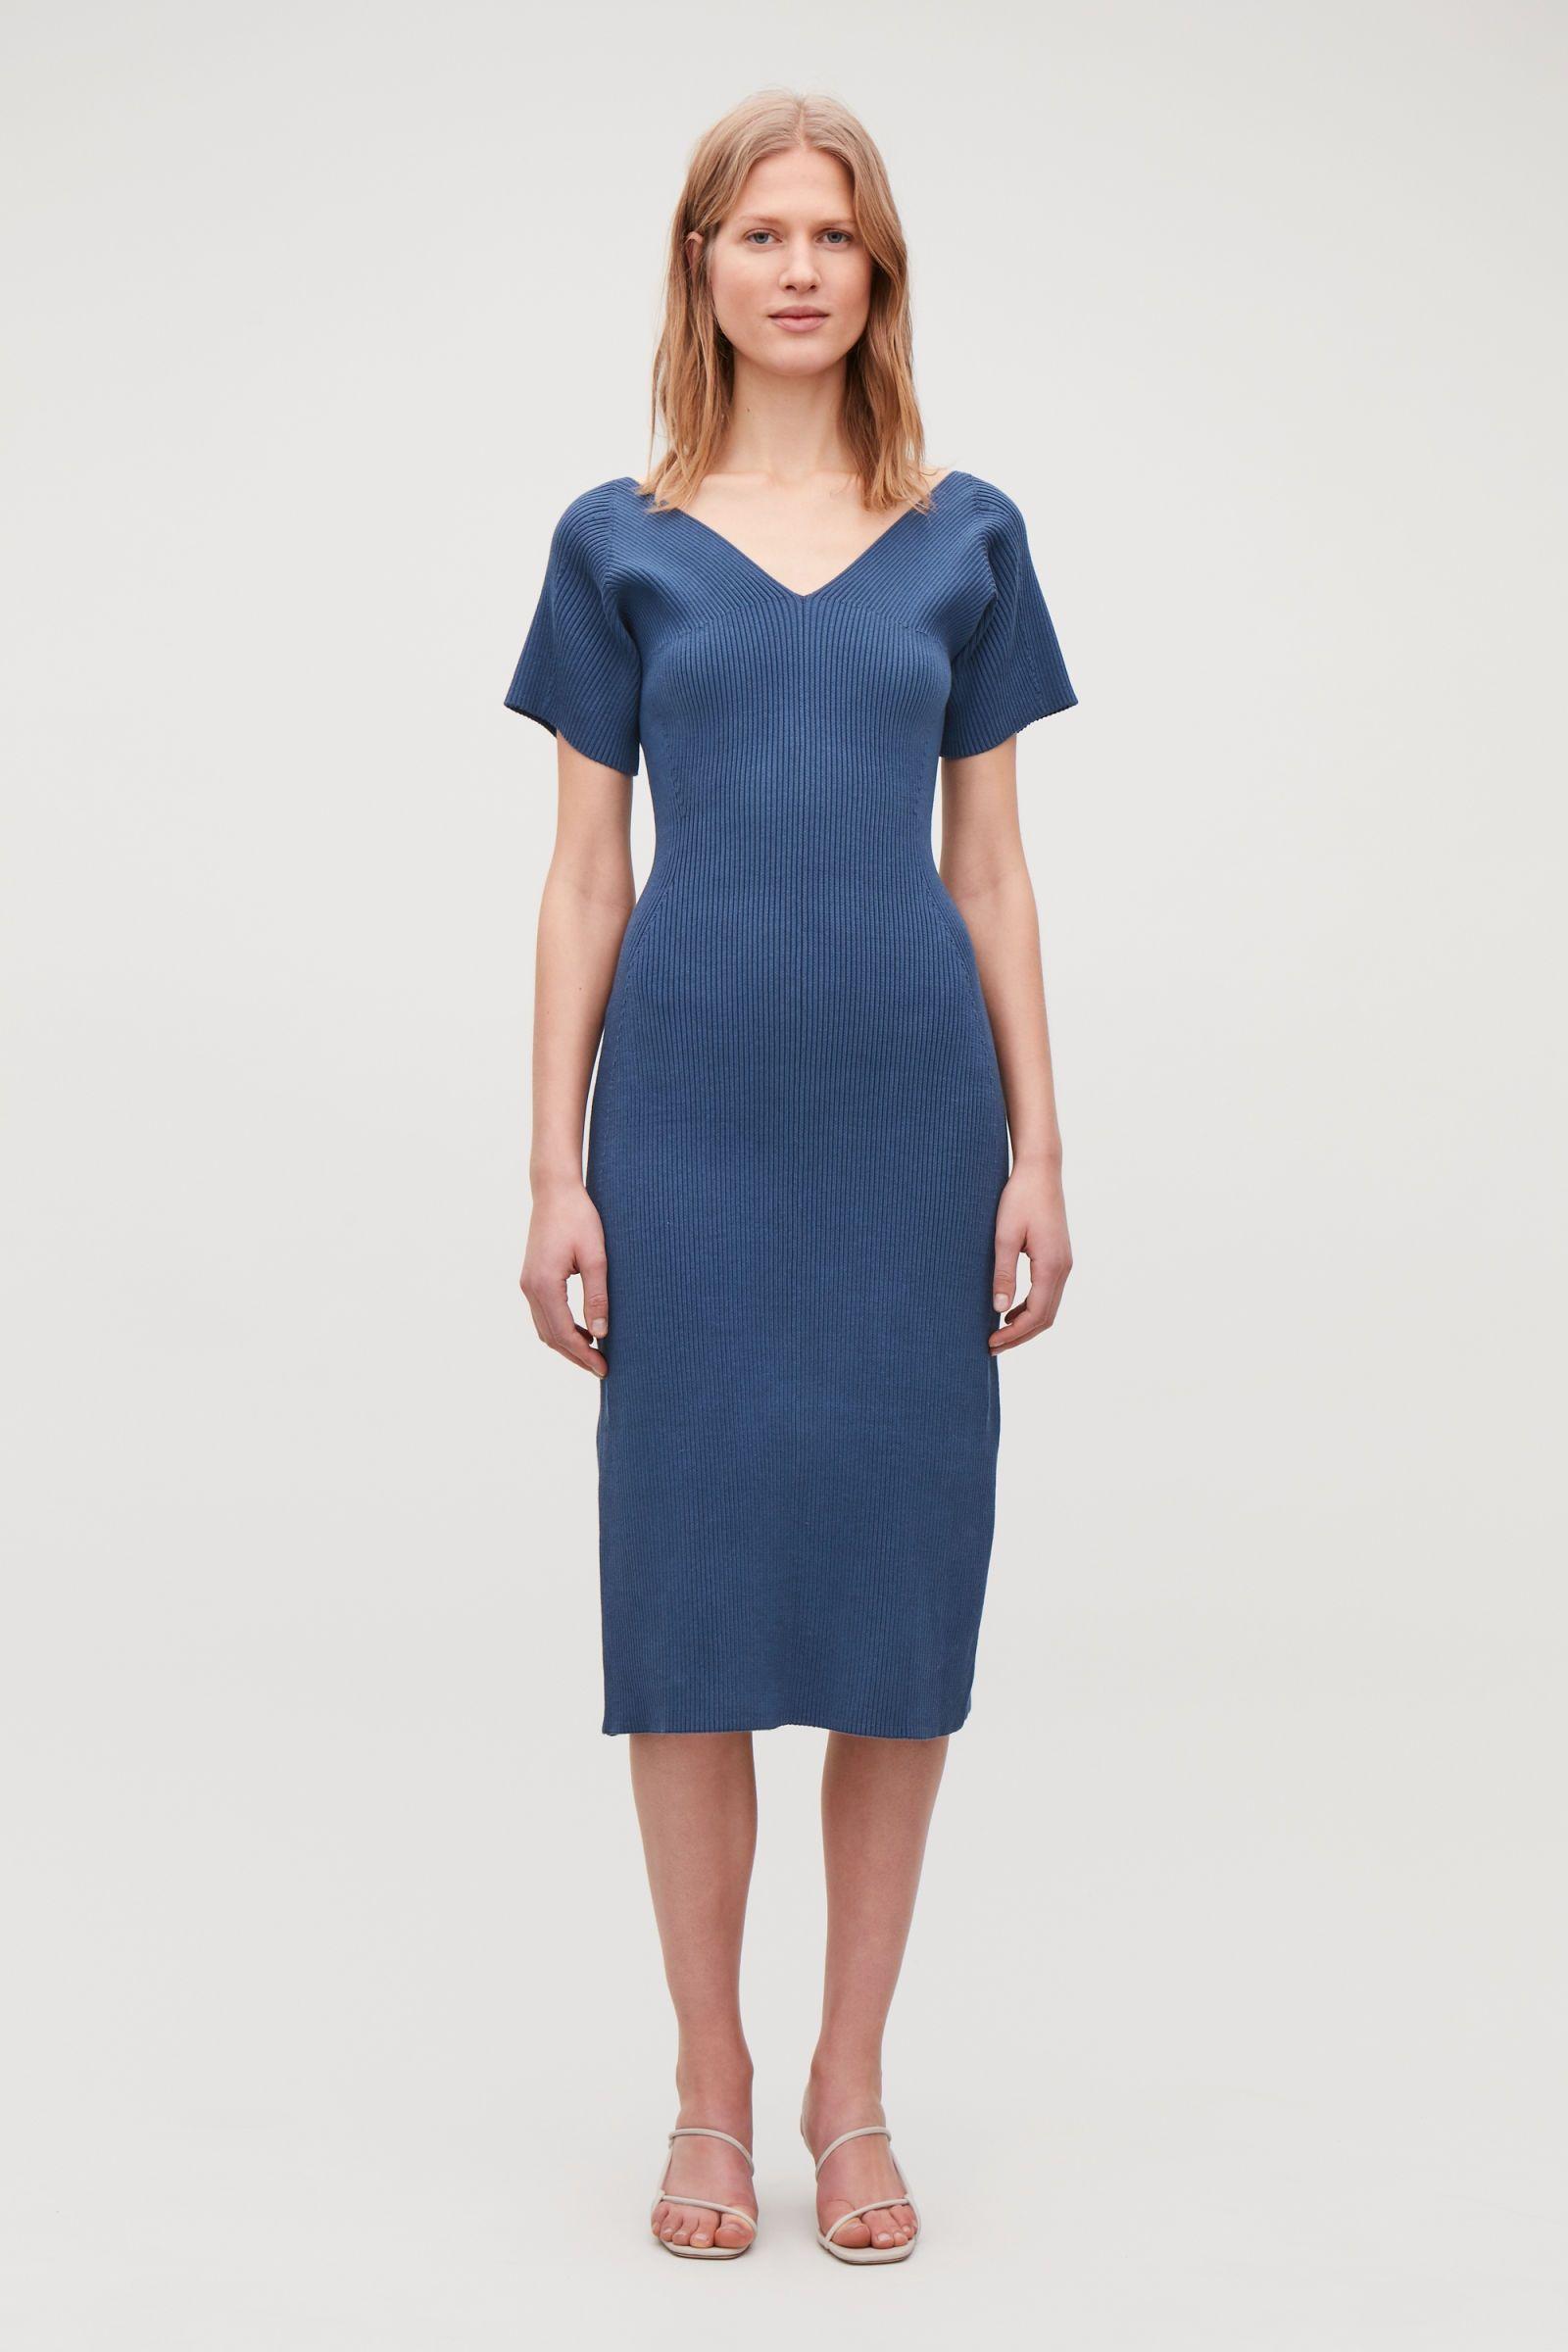 44d0caeeb497d RIBBED COTTON-KNIT V-NECK DRESS - Steel blue - Dresses - COS | SS 19 ...